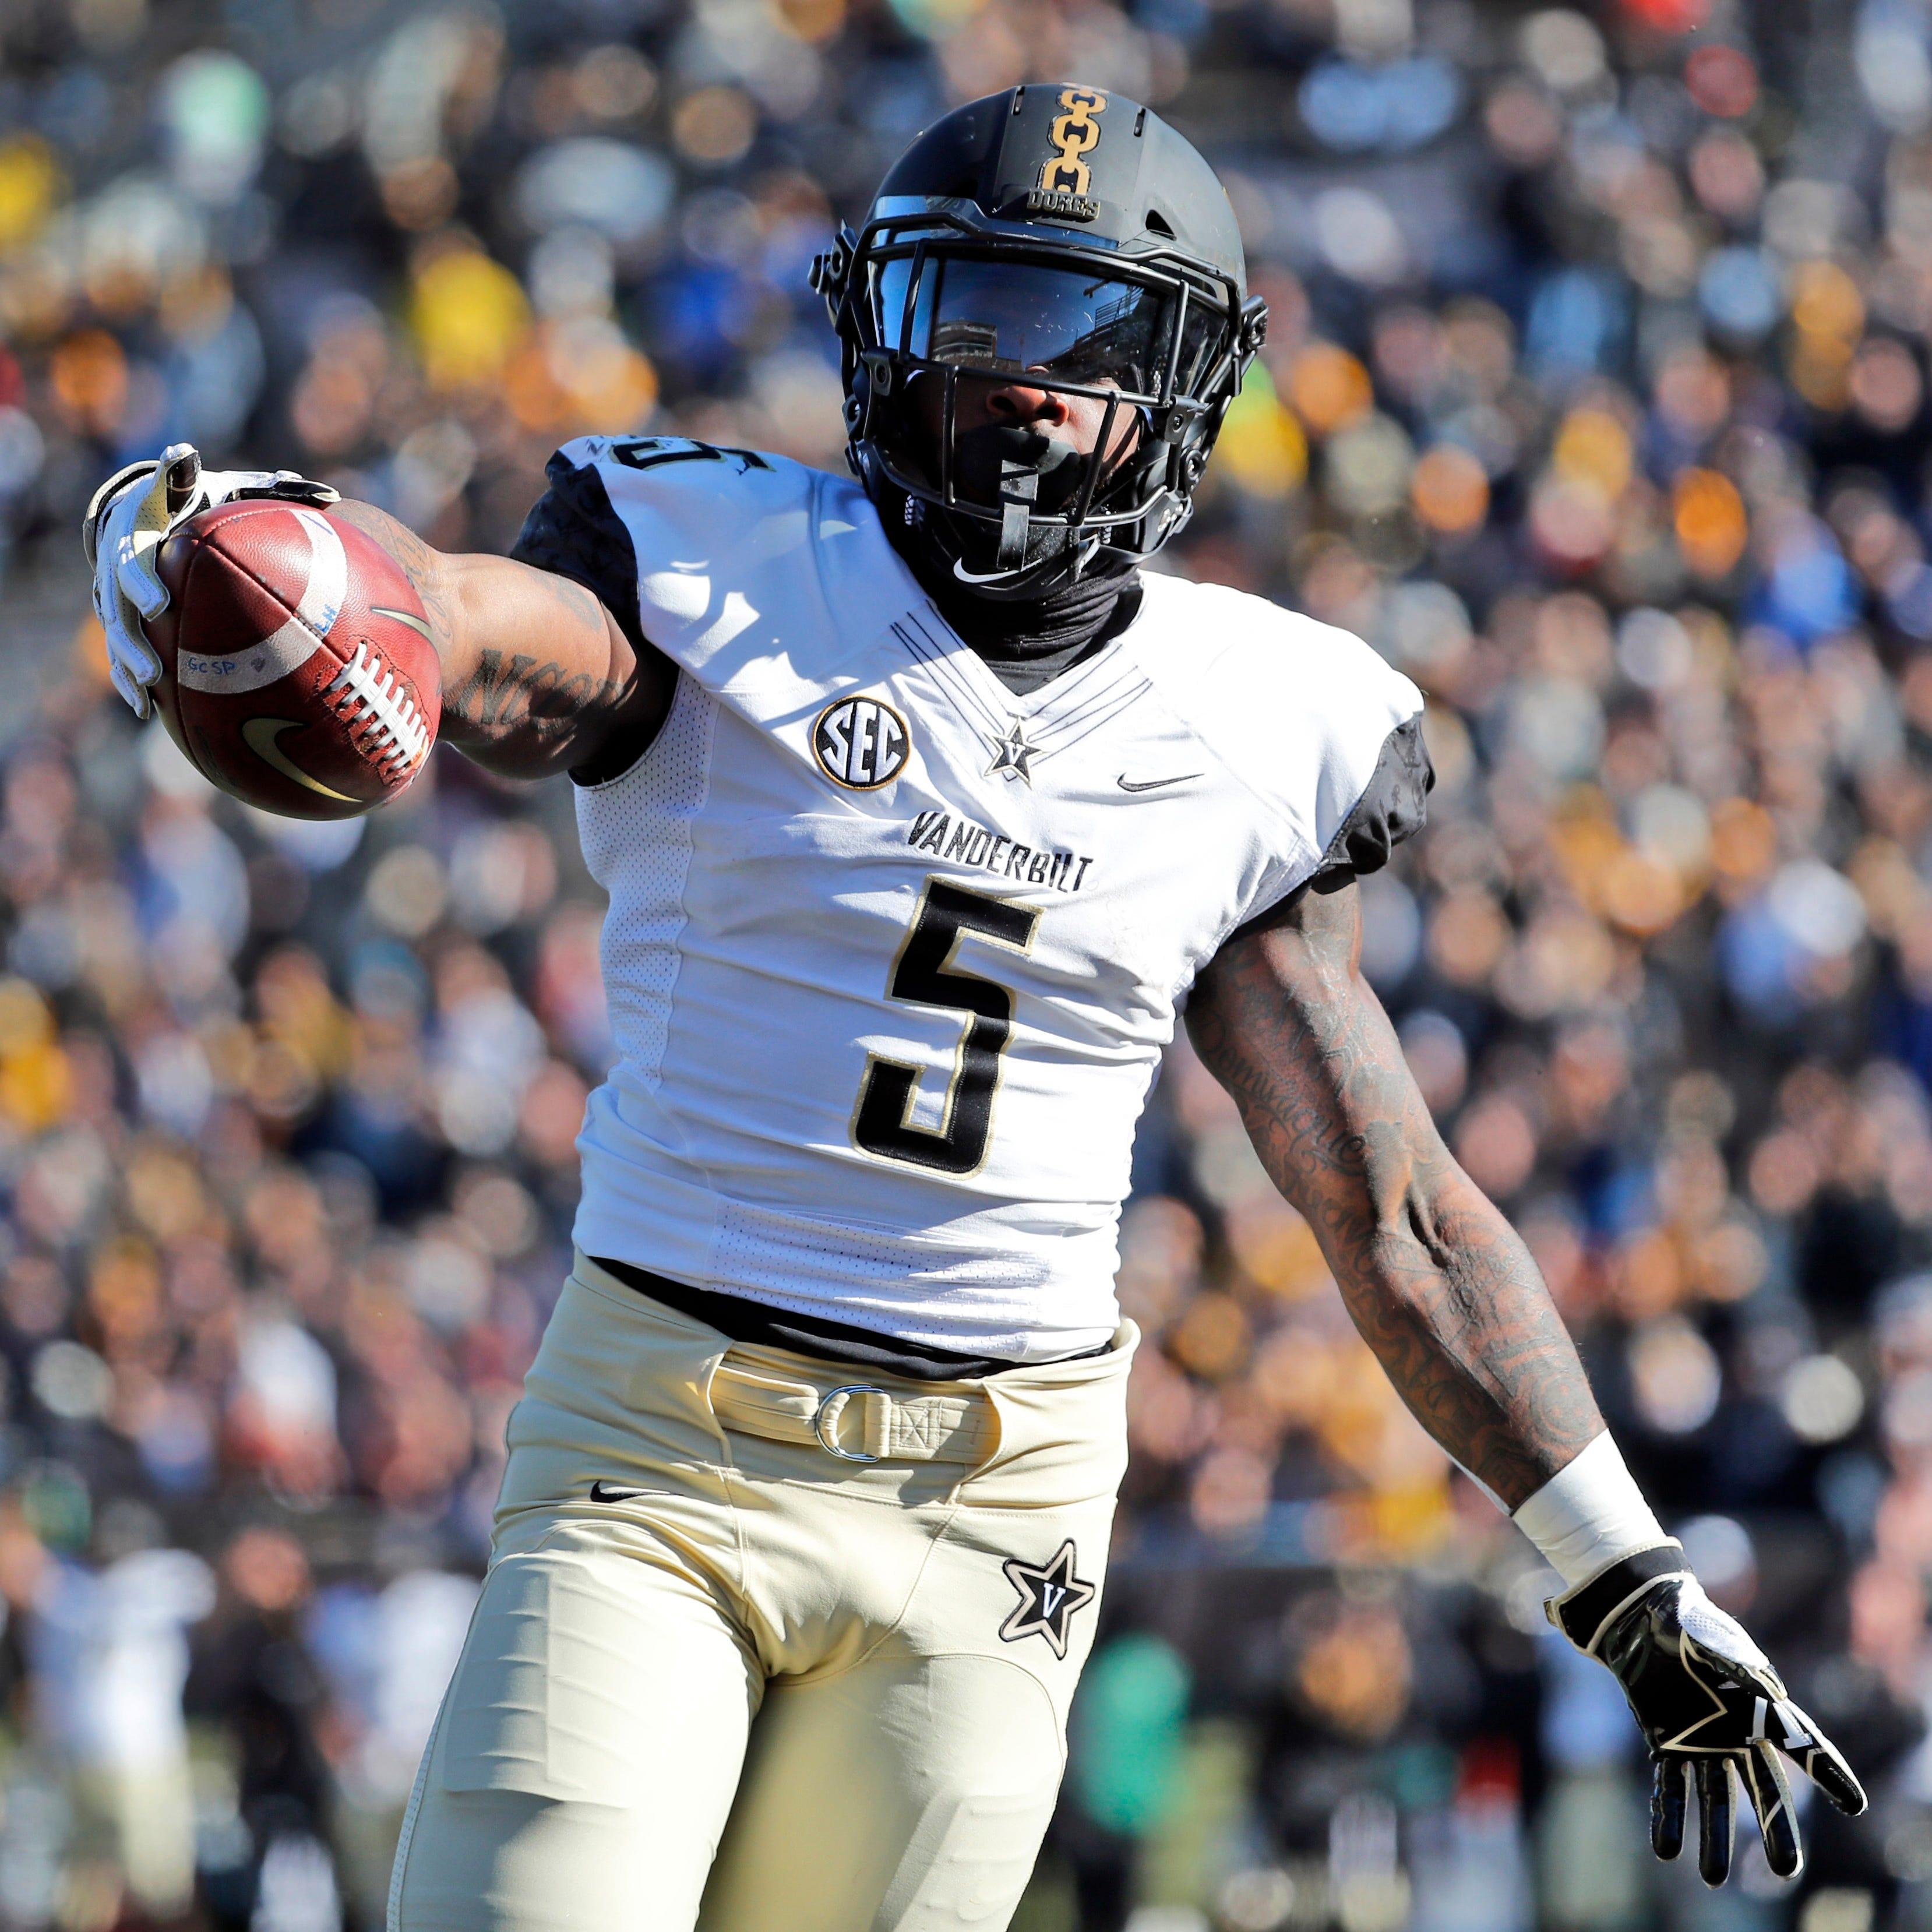 Ke'Shawn Vaughn earns SEC Newcomer of Year among four Vanderbilt players on All-SEC team